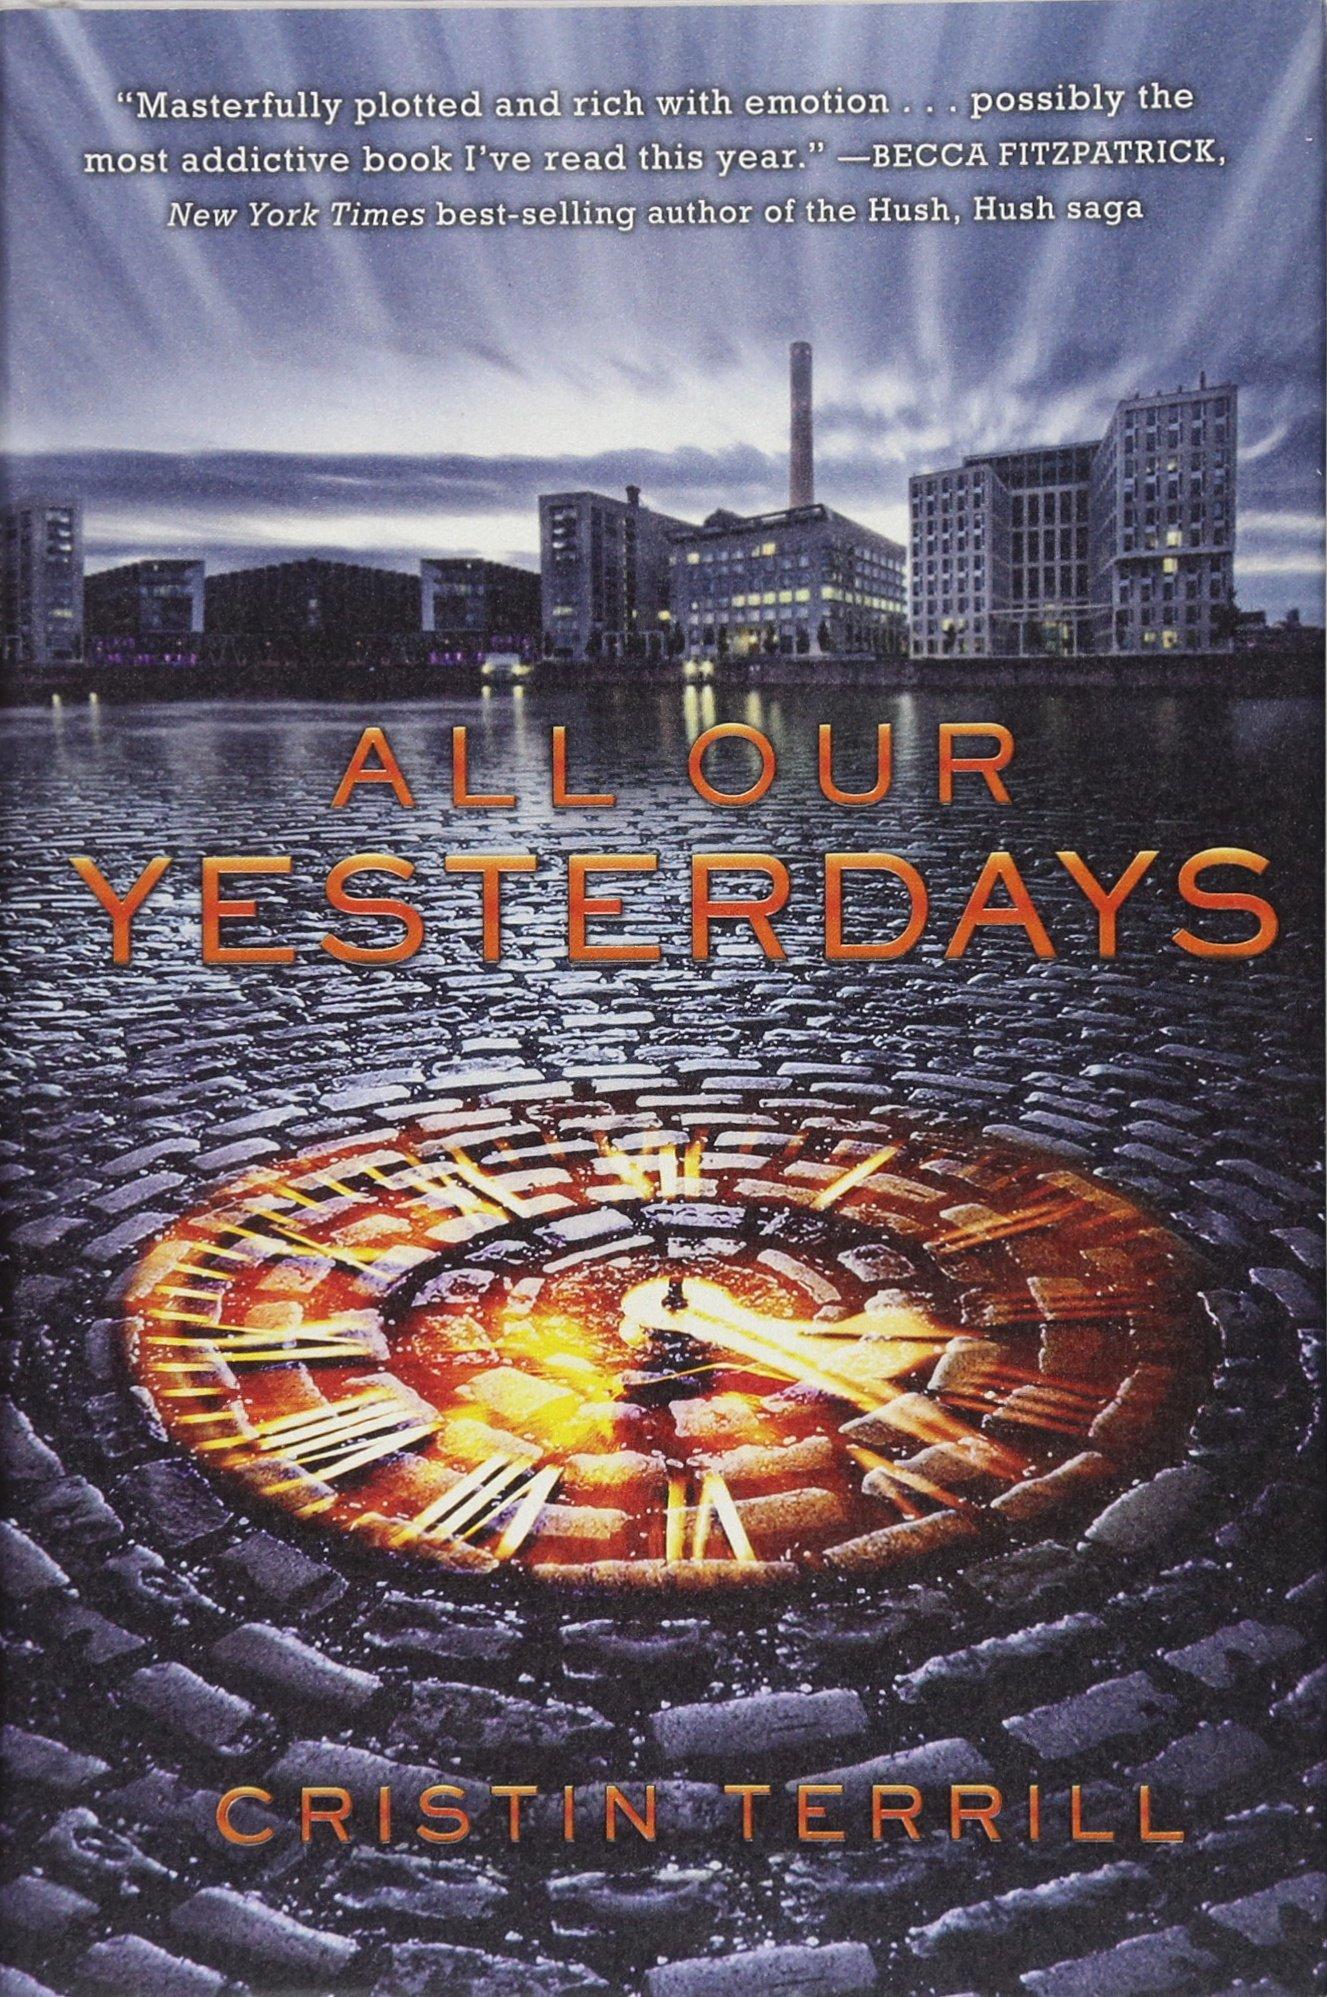 Amazon.com: All Our Yesterdays (9781423176374): Cristin ...